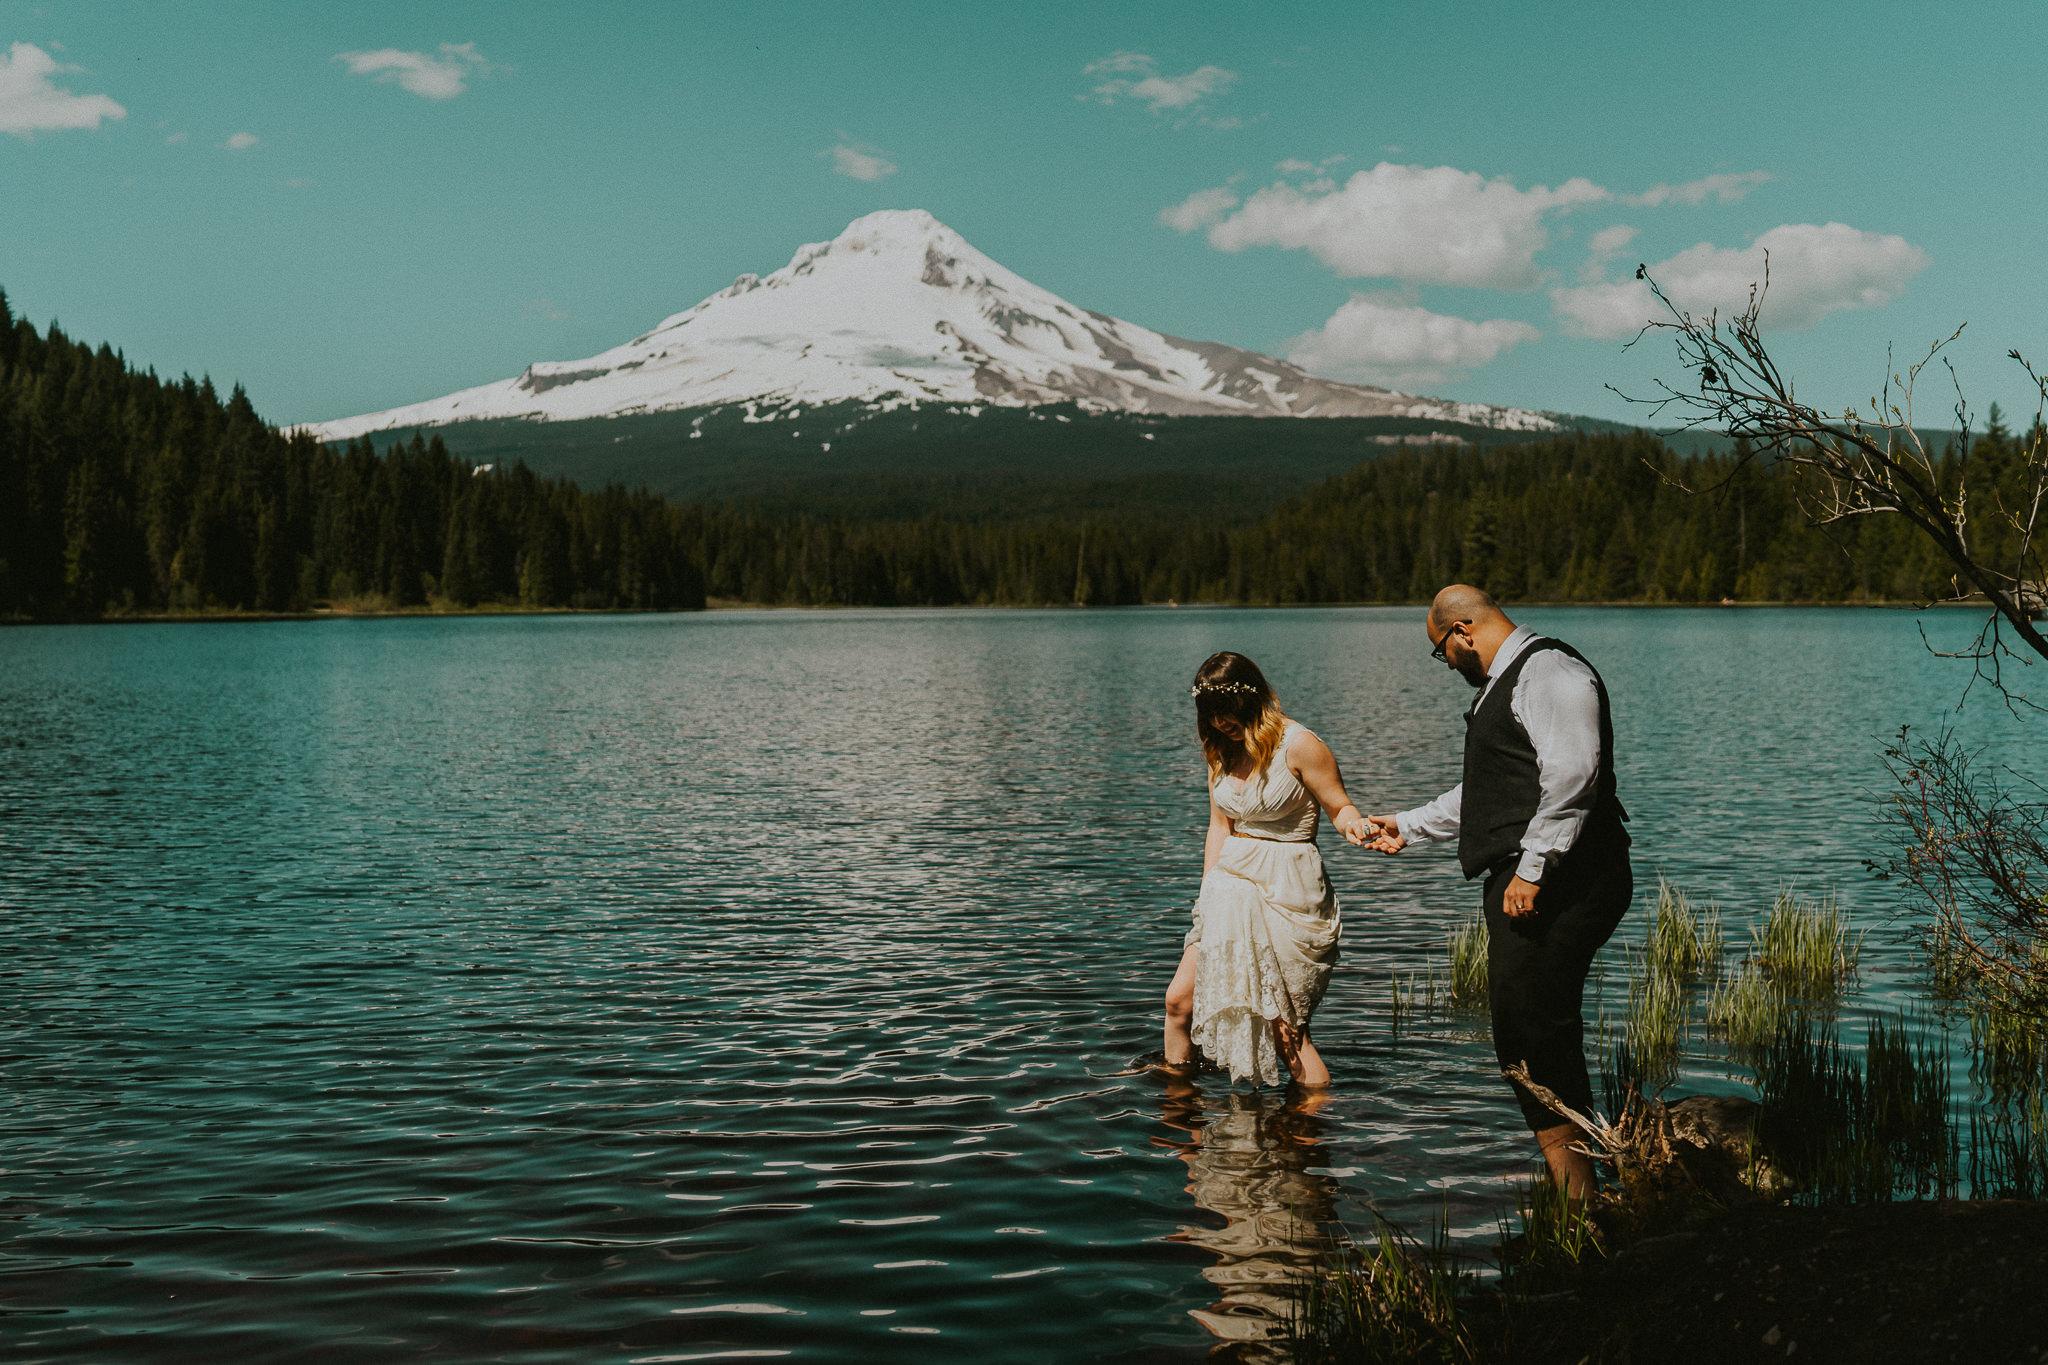 Trillium-Lake-Junebug-Weddings-Photographer-Alfred-Tang